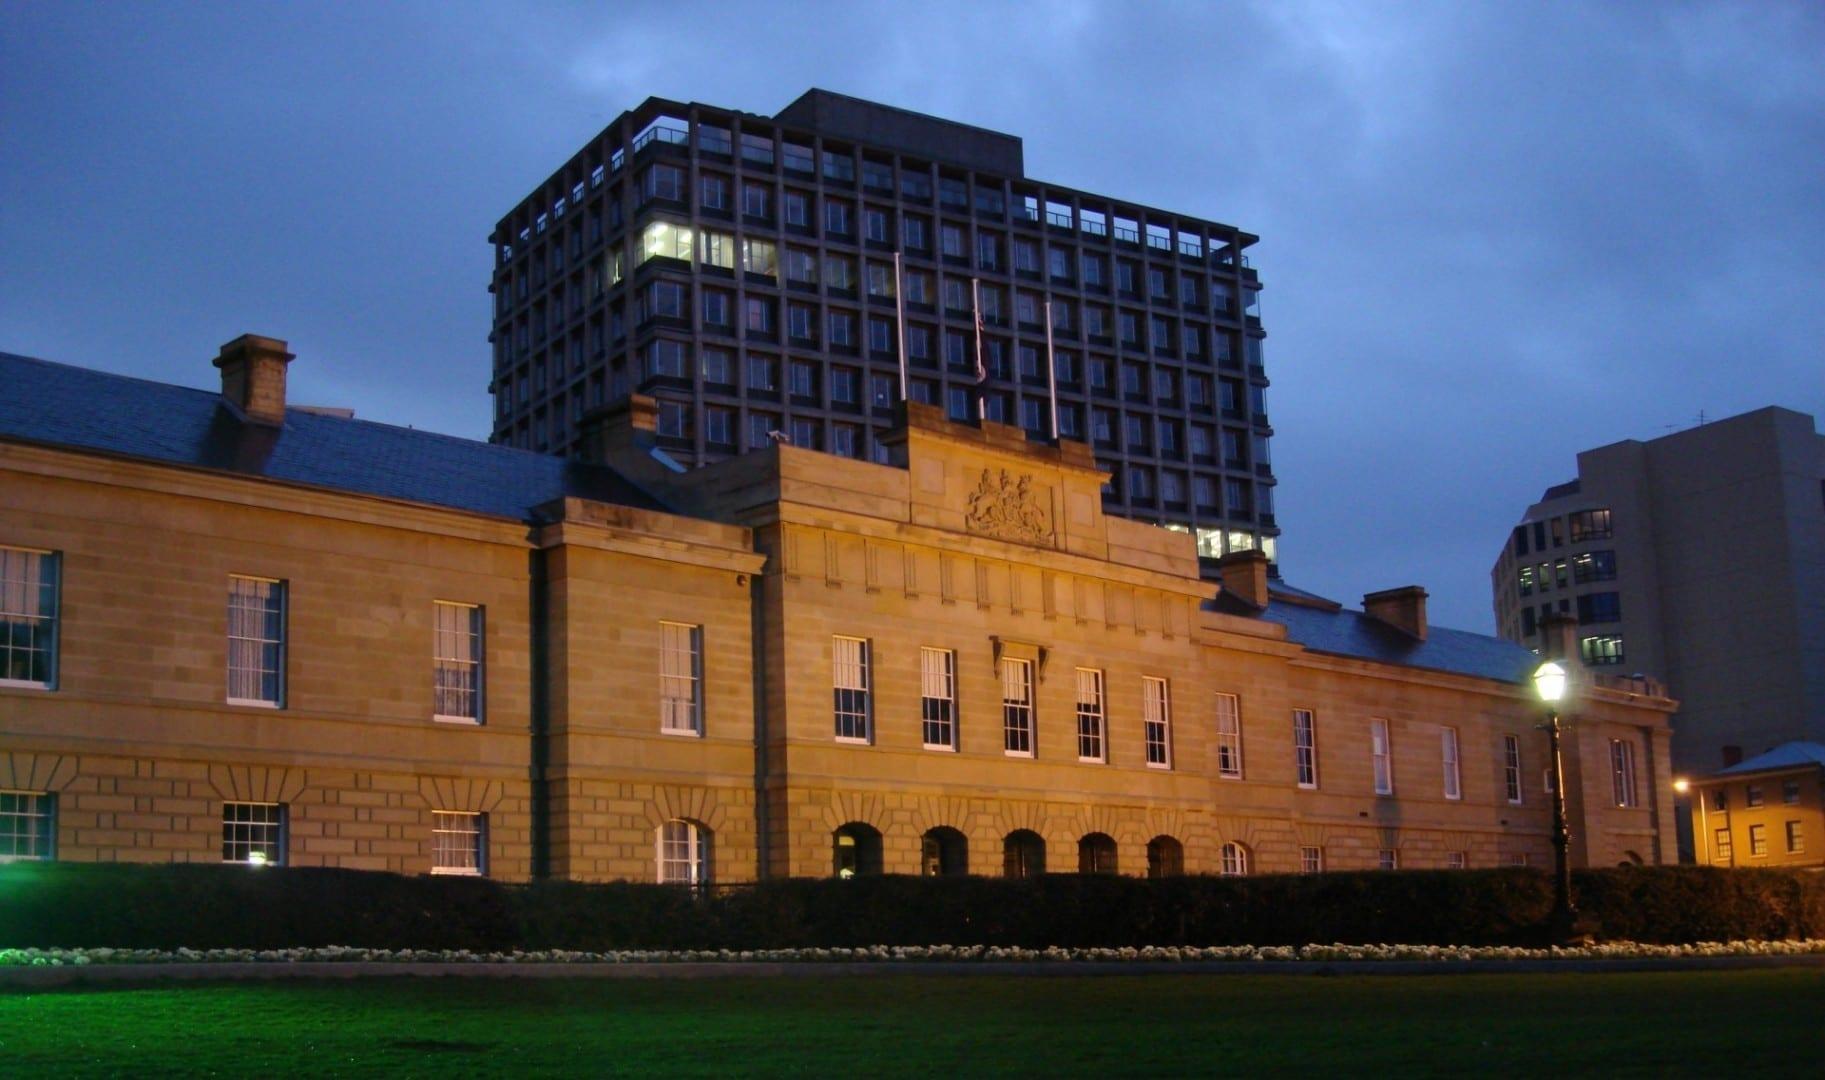 La fachada de arenisca de la Casa del Parlamento Hobart Australia